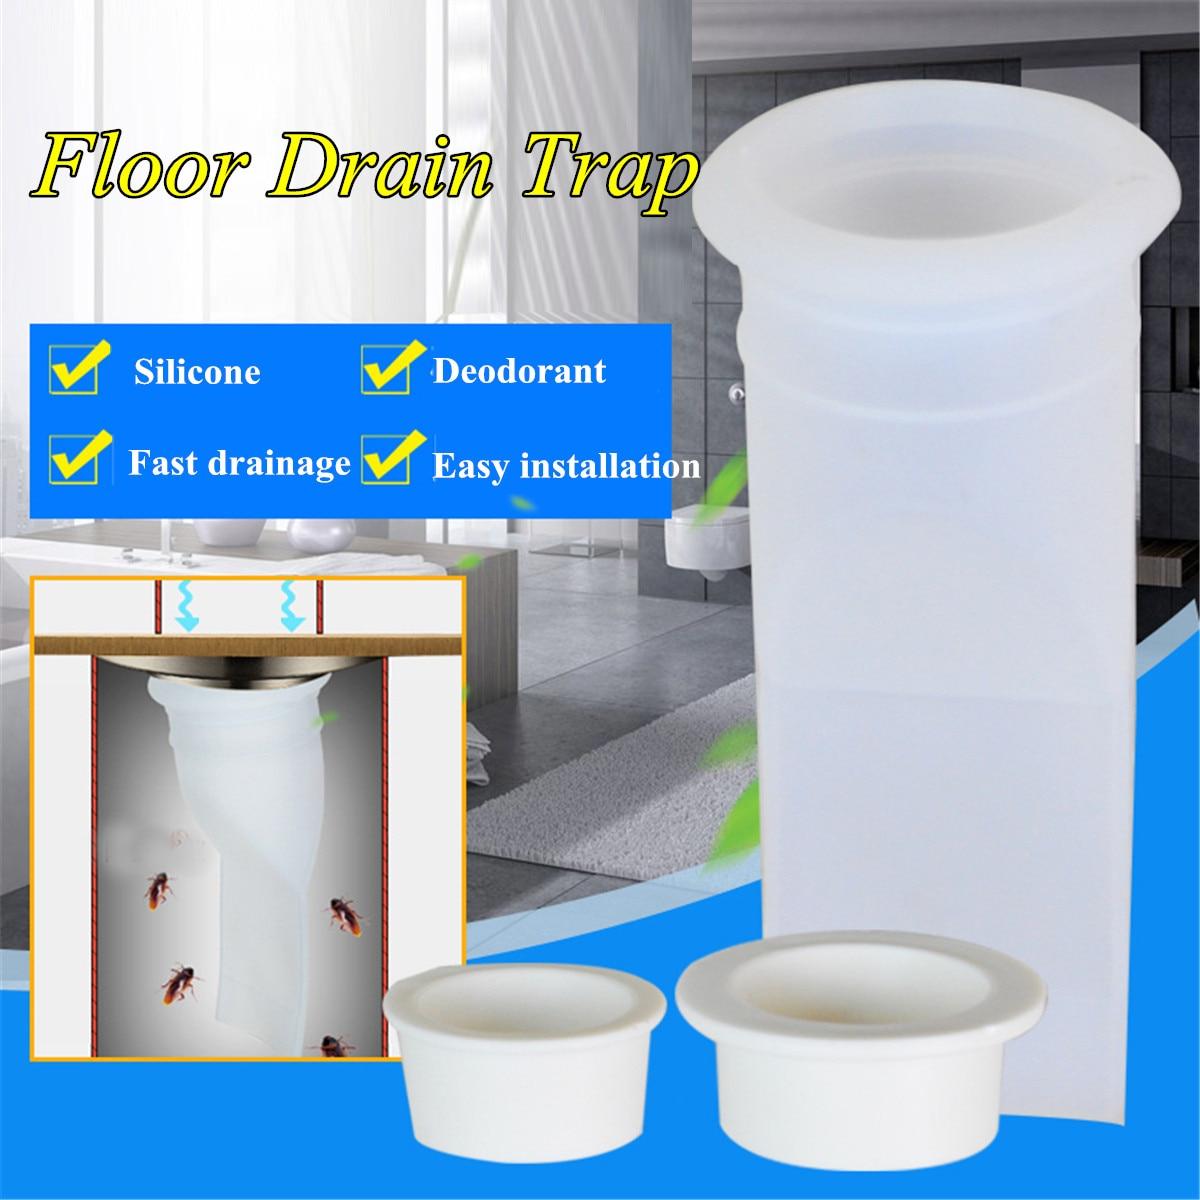 White Silicone Shower Floor Water Drain Bathroom Odor-proof Pipe Sewer Core Deodorant Strainer Kitchen Sink Drain Accessories